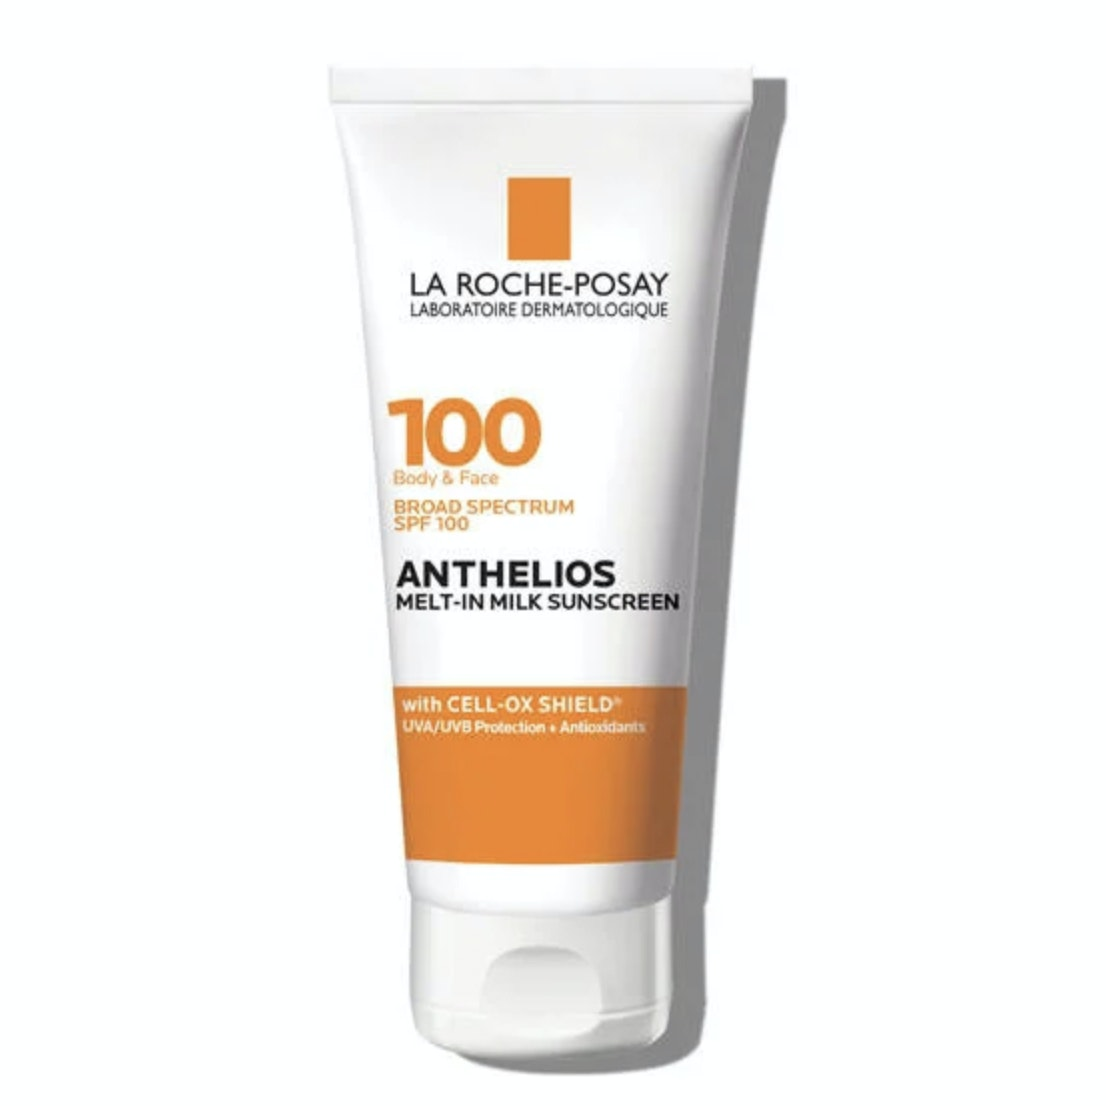 La Roche-Posay® Anthelios 100 Melt-In Sunscreen Milk Broad Spectrum SPF 100